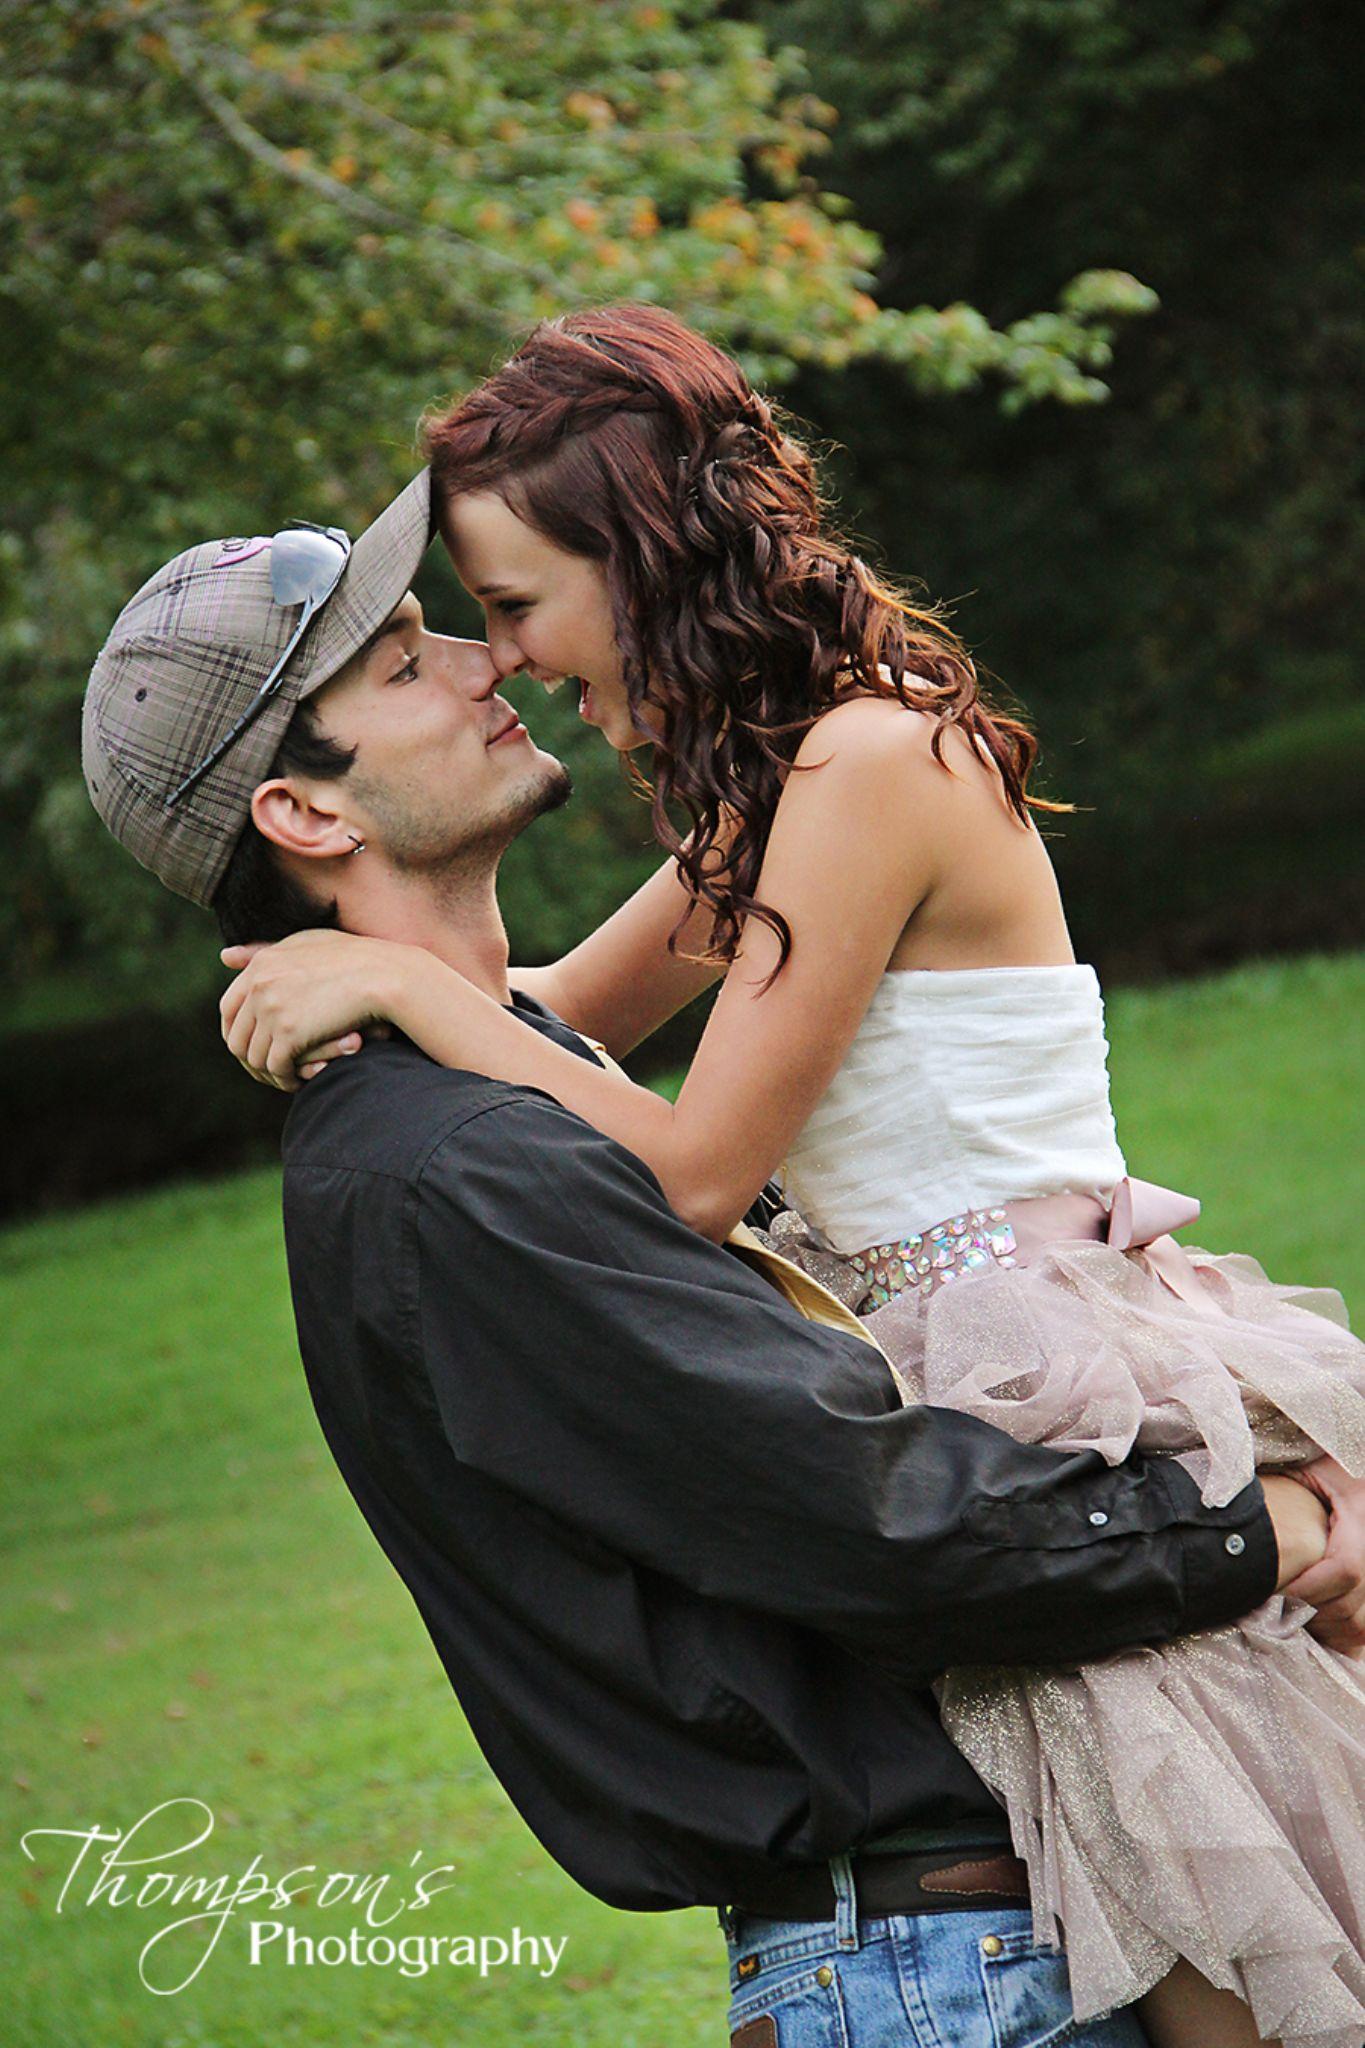 True love 2 by AngieThompson